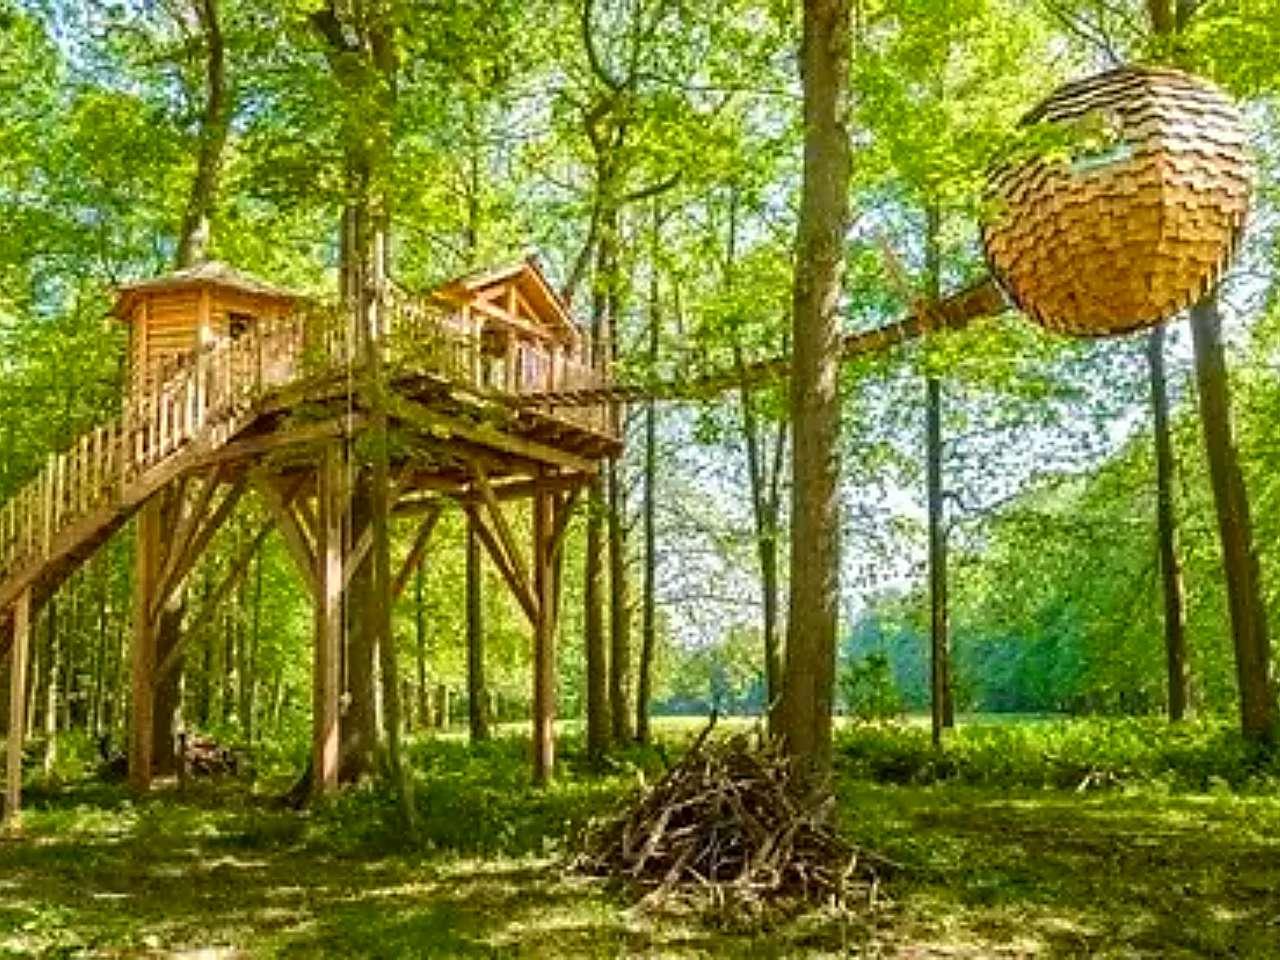 rumah-pohon-modern.jpg